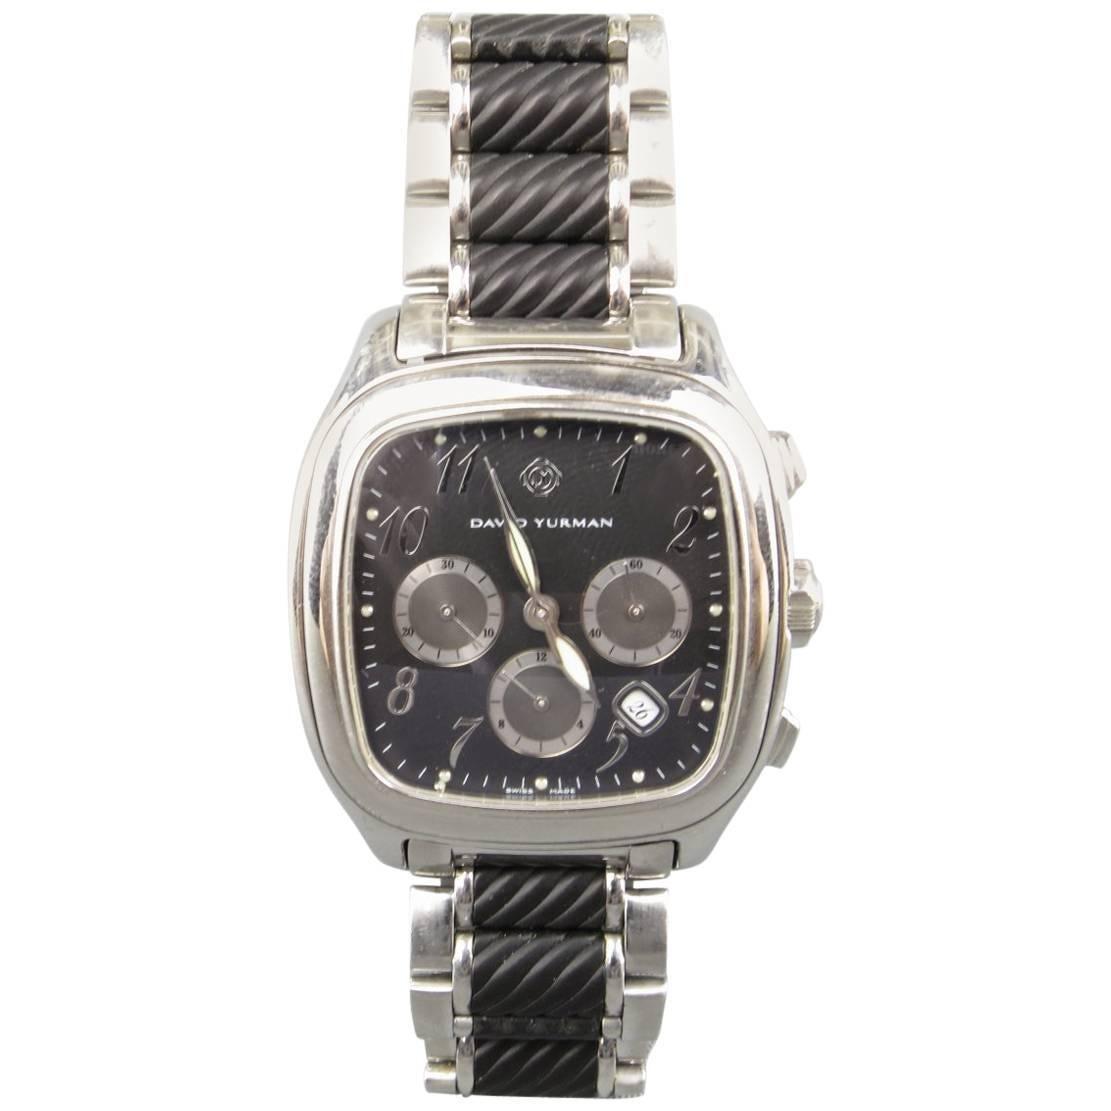 david yurman silver u0026 black stainless steel chronograph watch 1